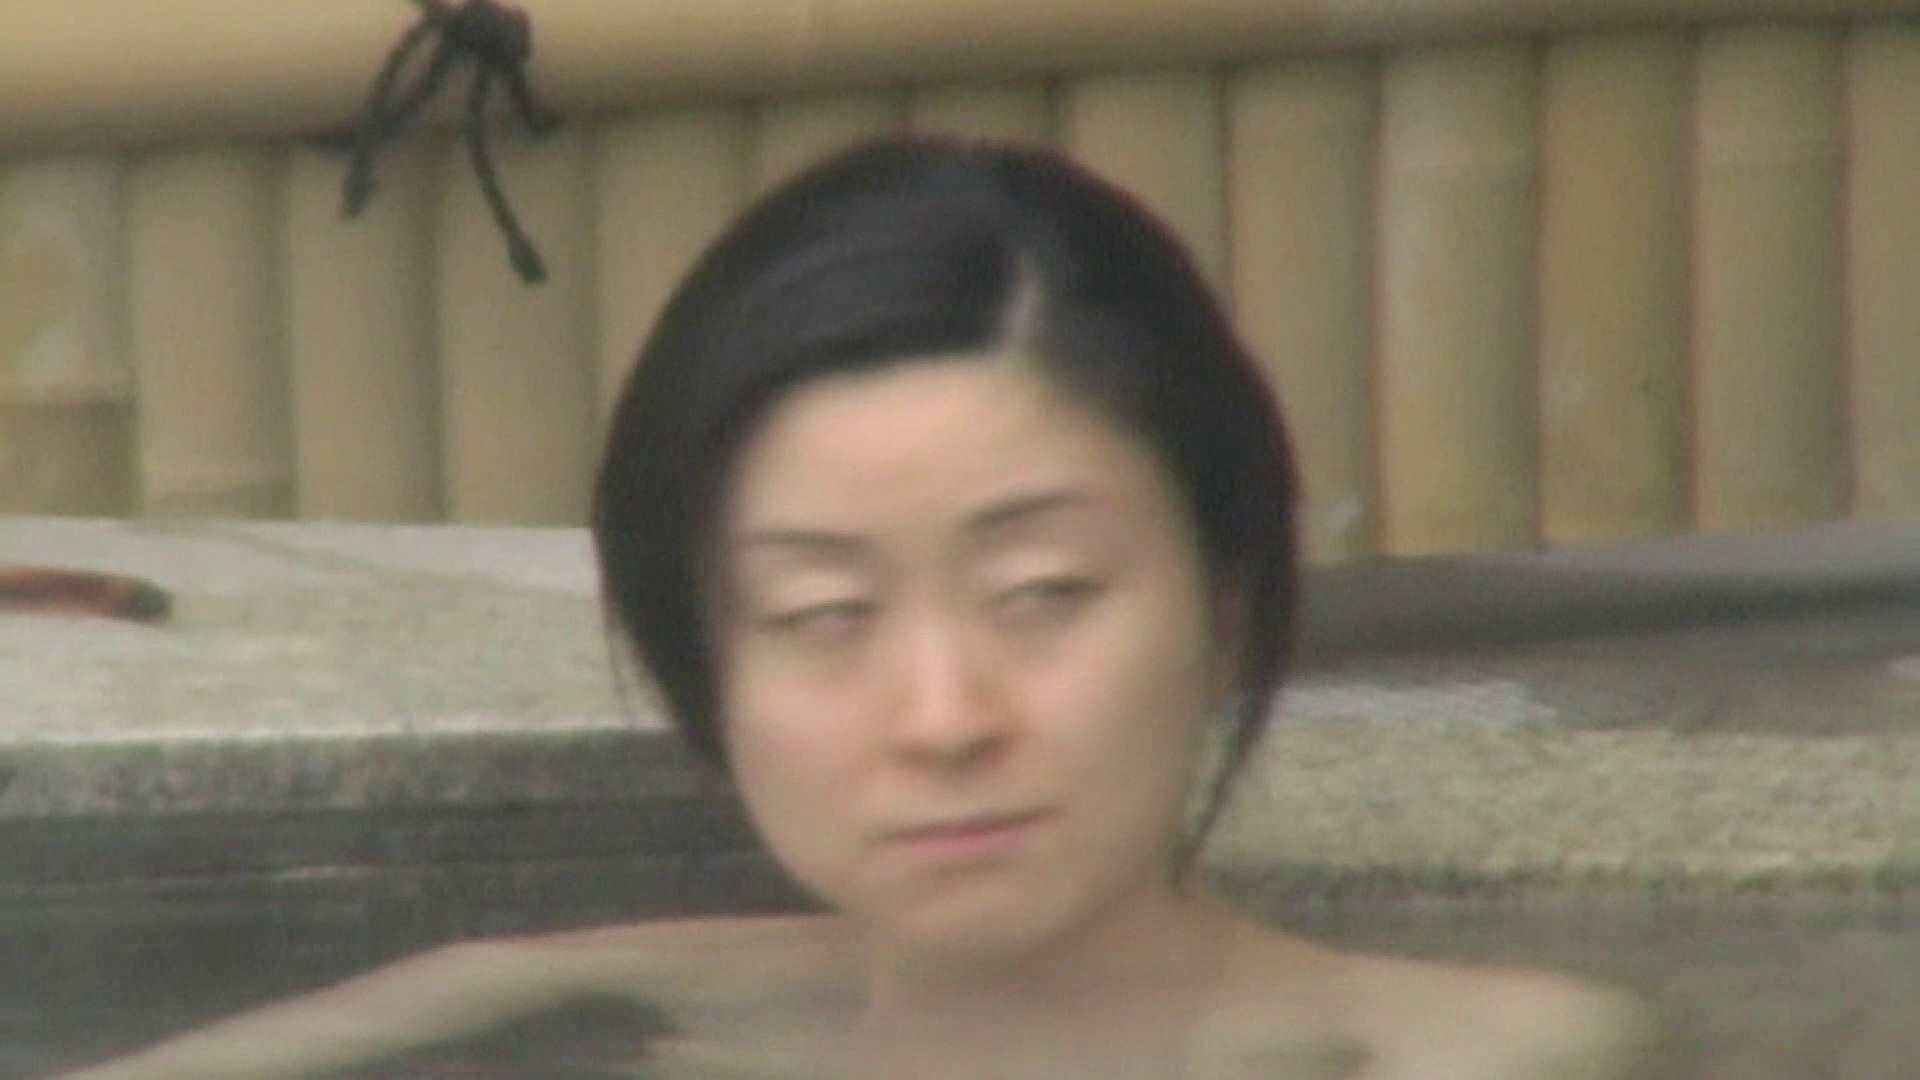 Aquaな露天風呂Vol.548 OLセックス のぞきエロ無料画像 103画像 38